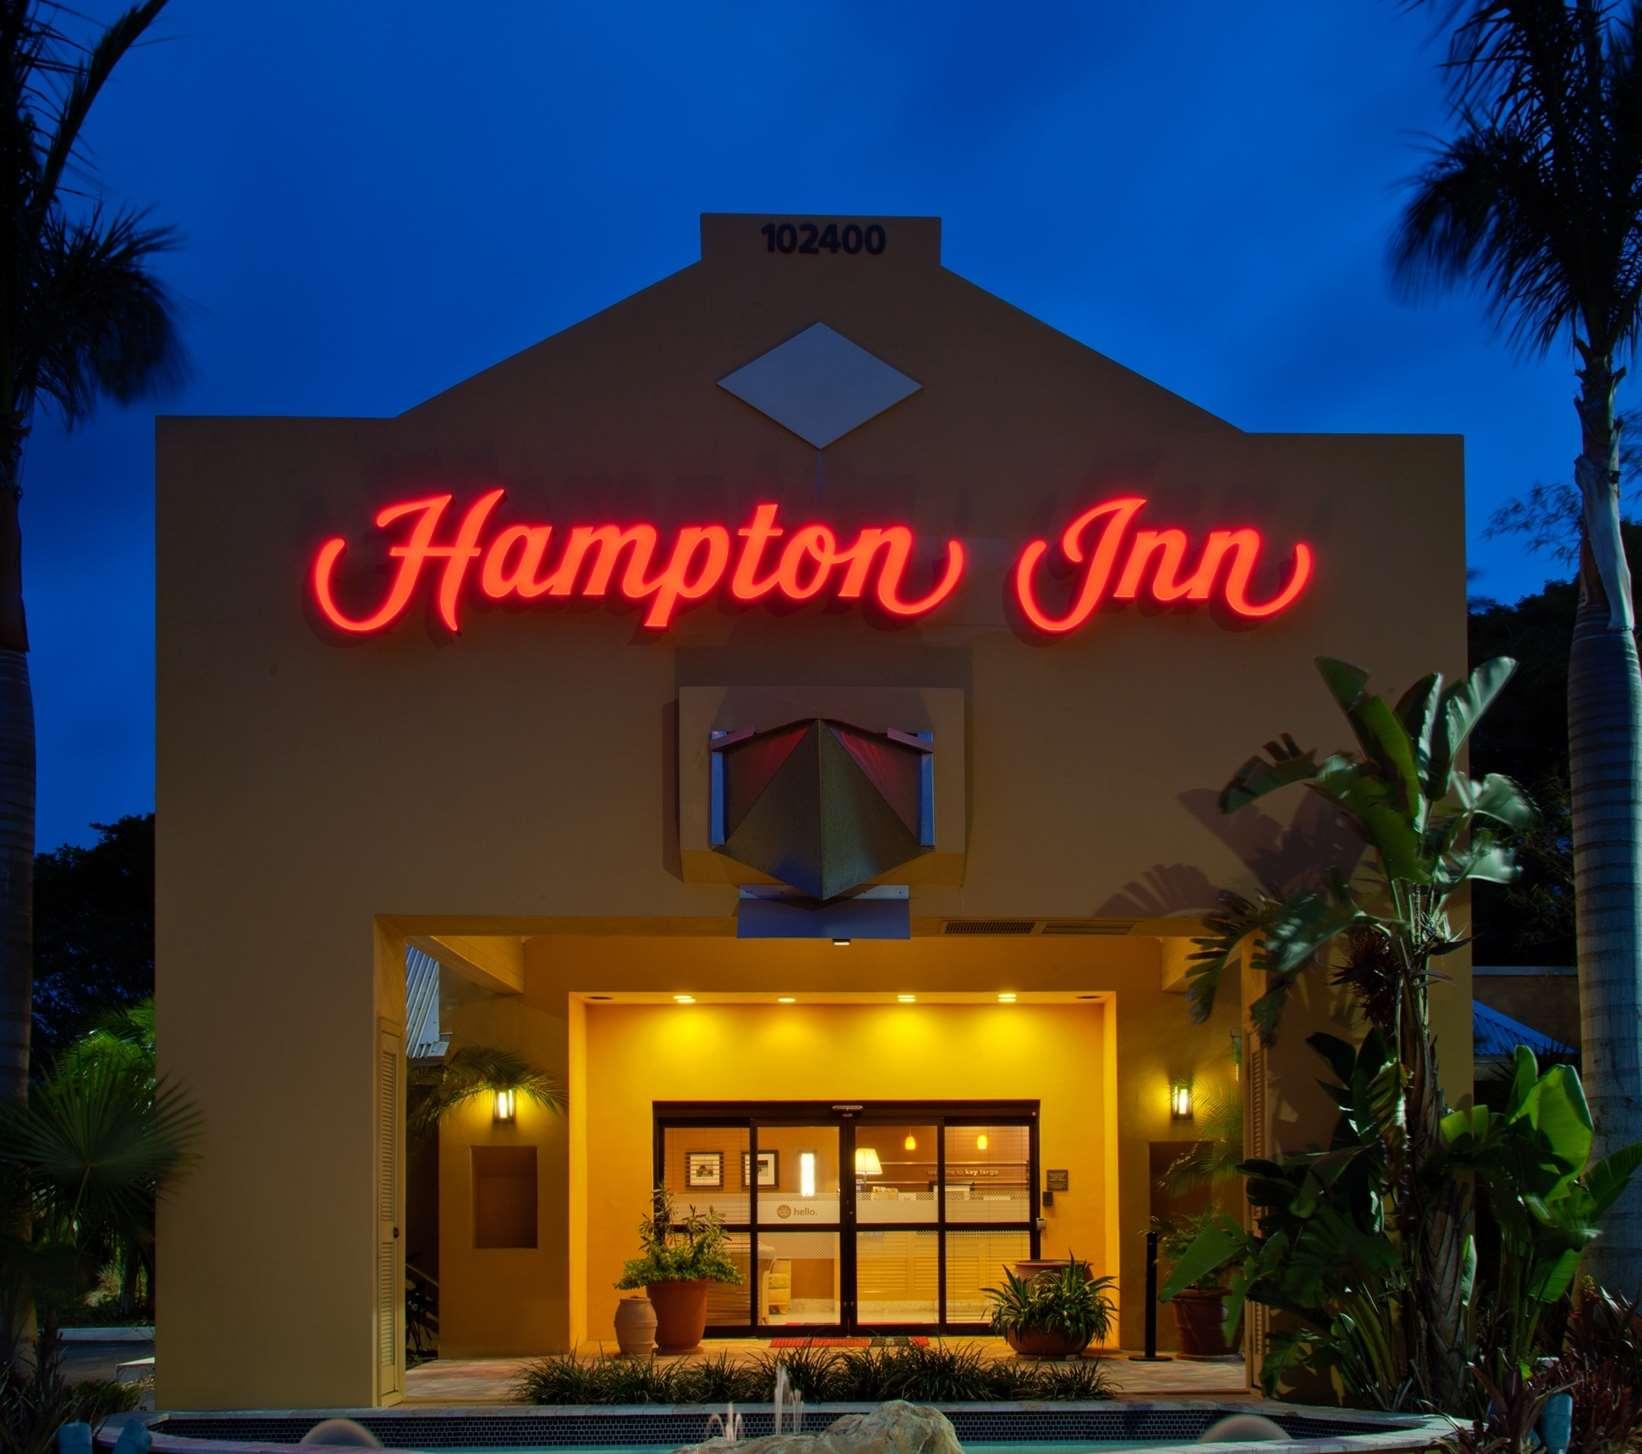 Hampton Inn Key Largo, FL image 7